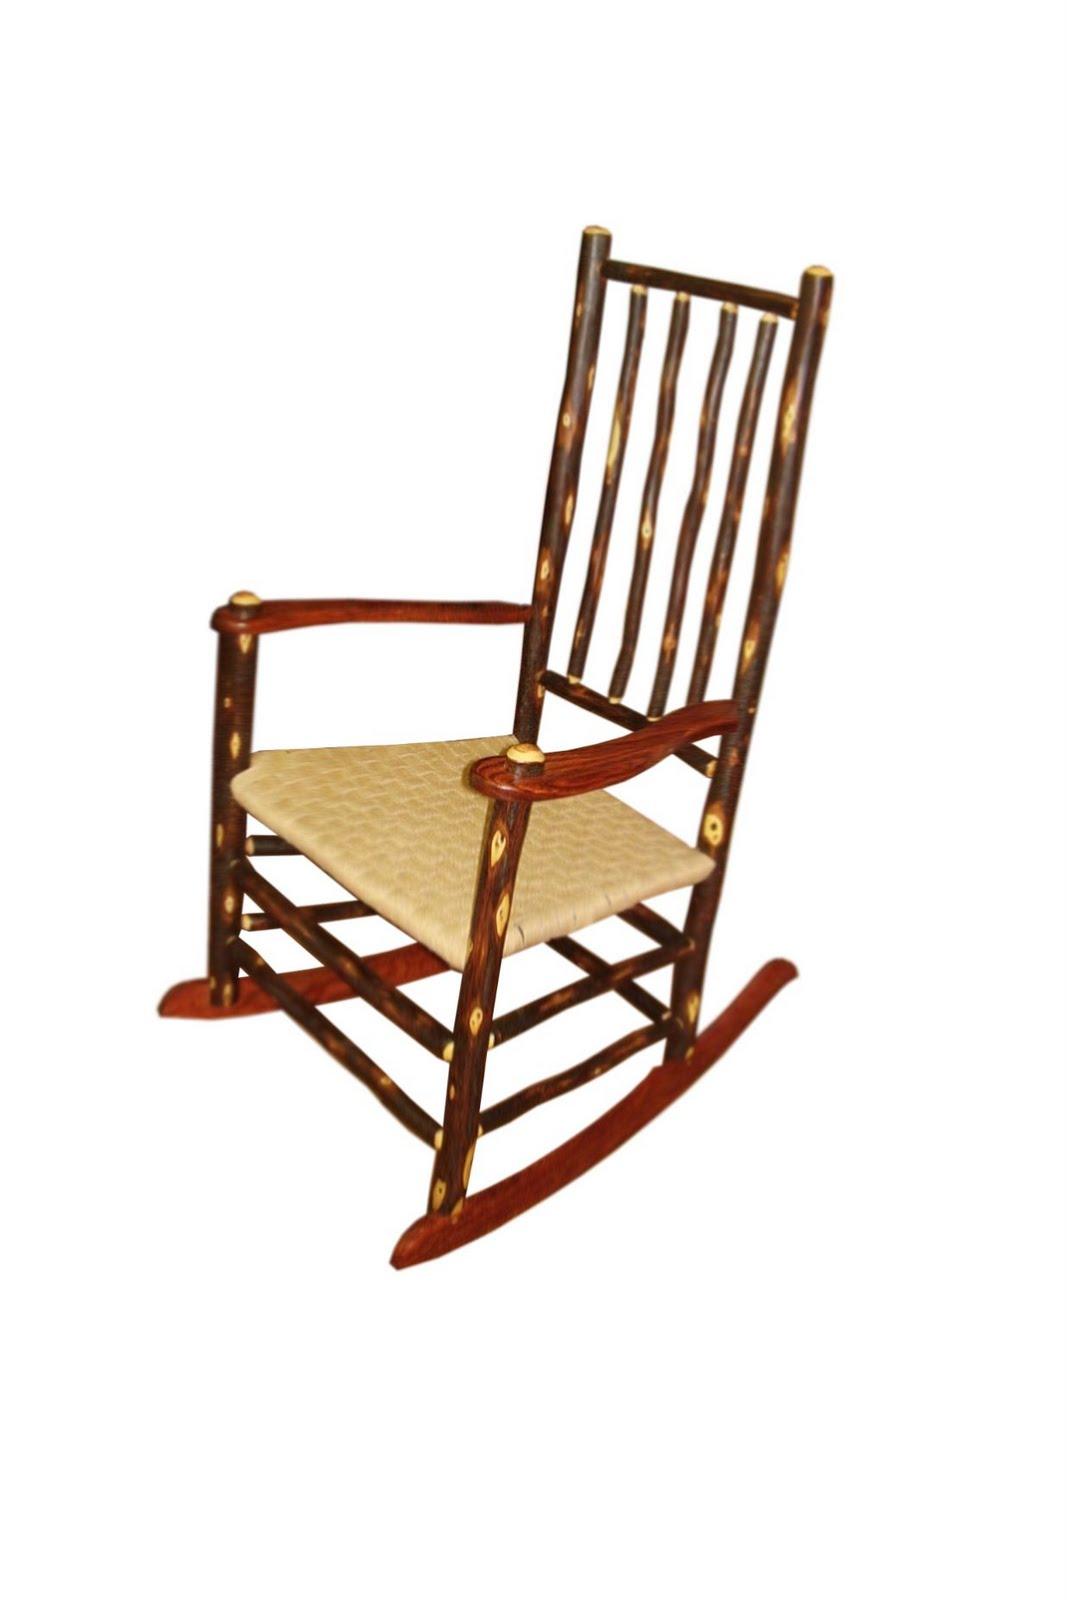 Rose Wood Craft Rustic Rocking Chair